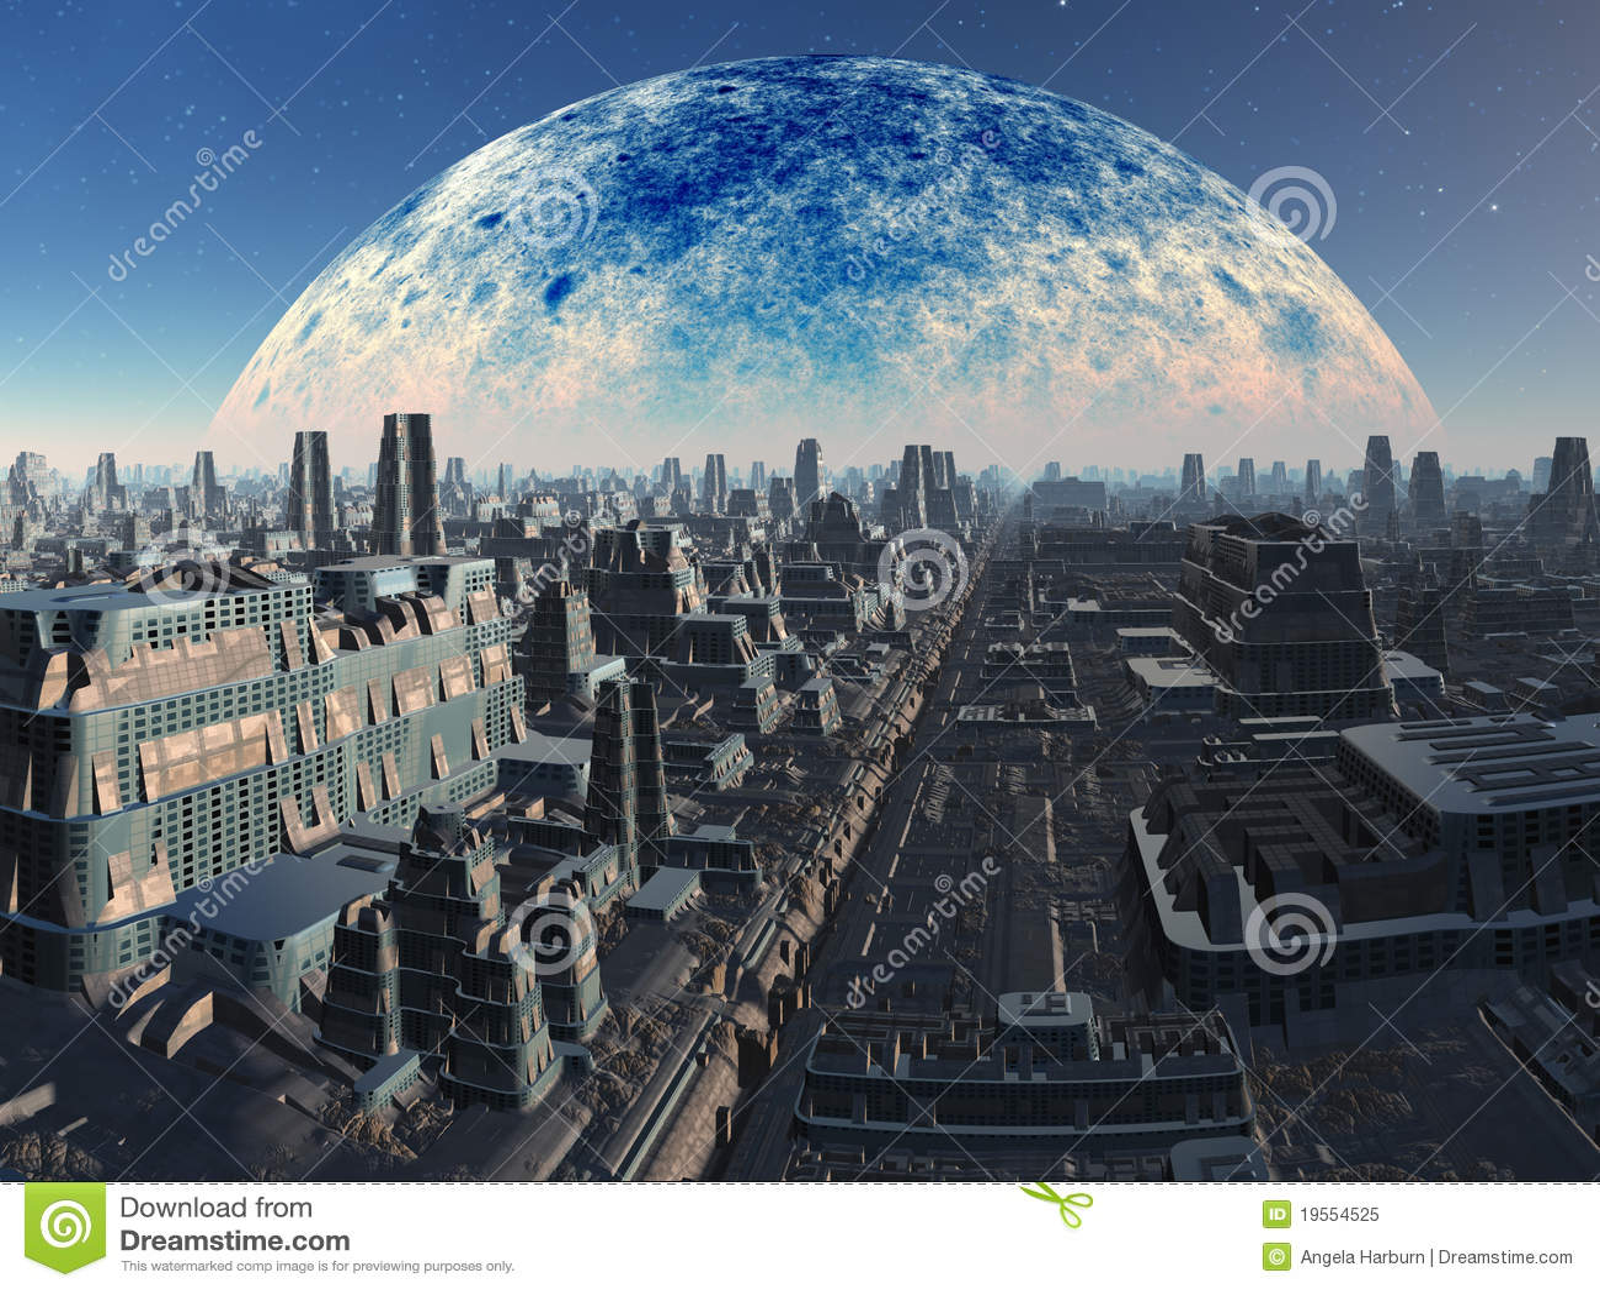 Futuristic Alien Industrial Cityscape Royalty Free Stock